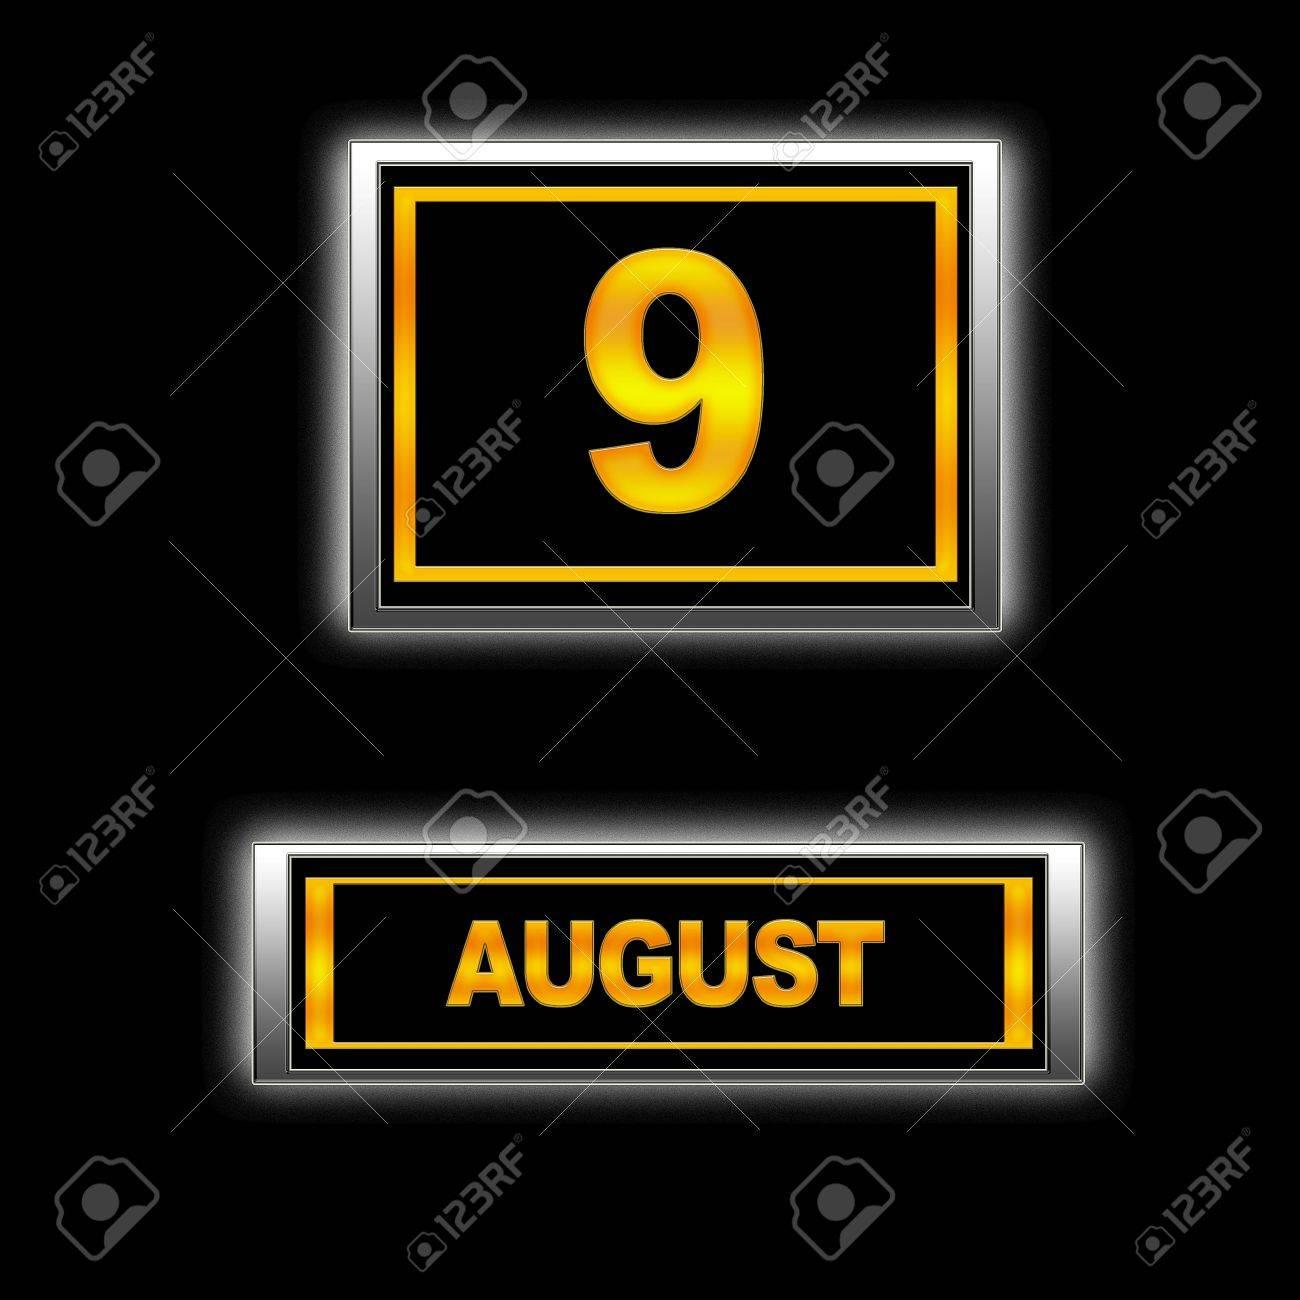 Illustration with Calendar, August 9. Stock Illustration - 13256338